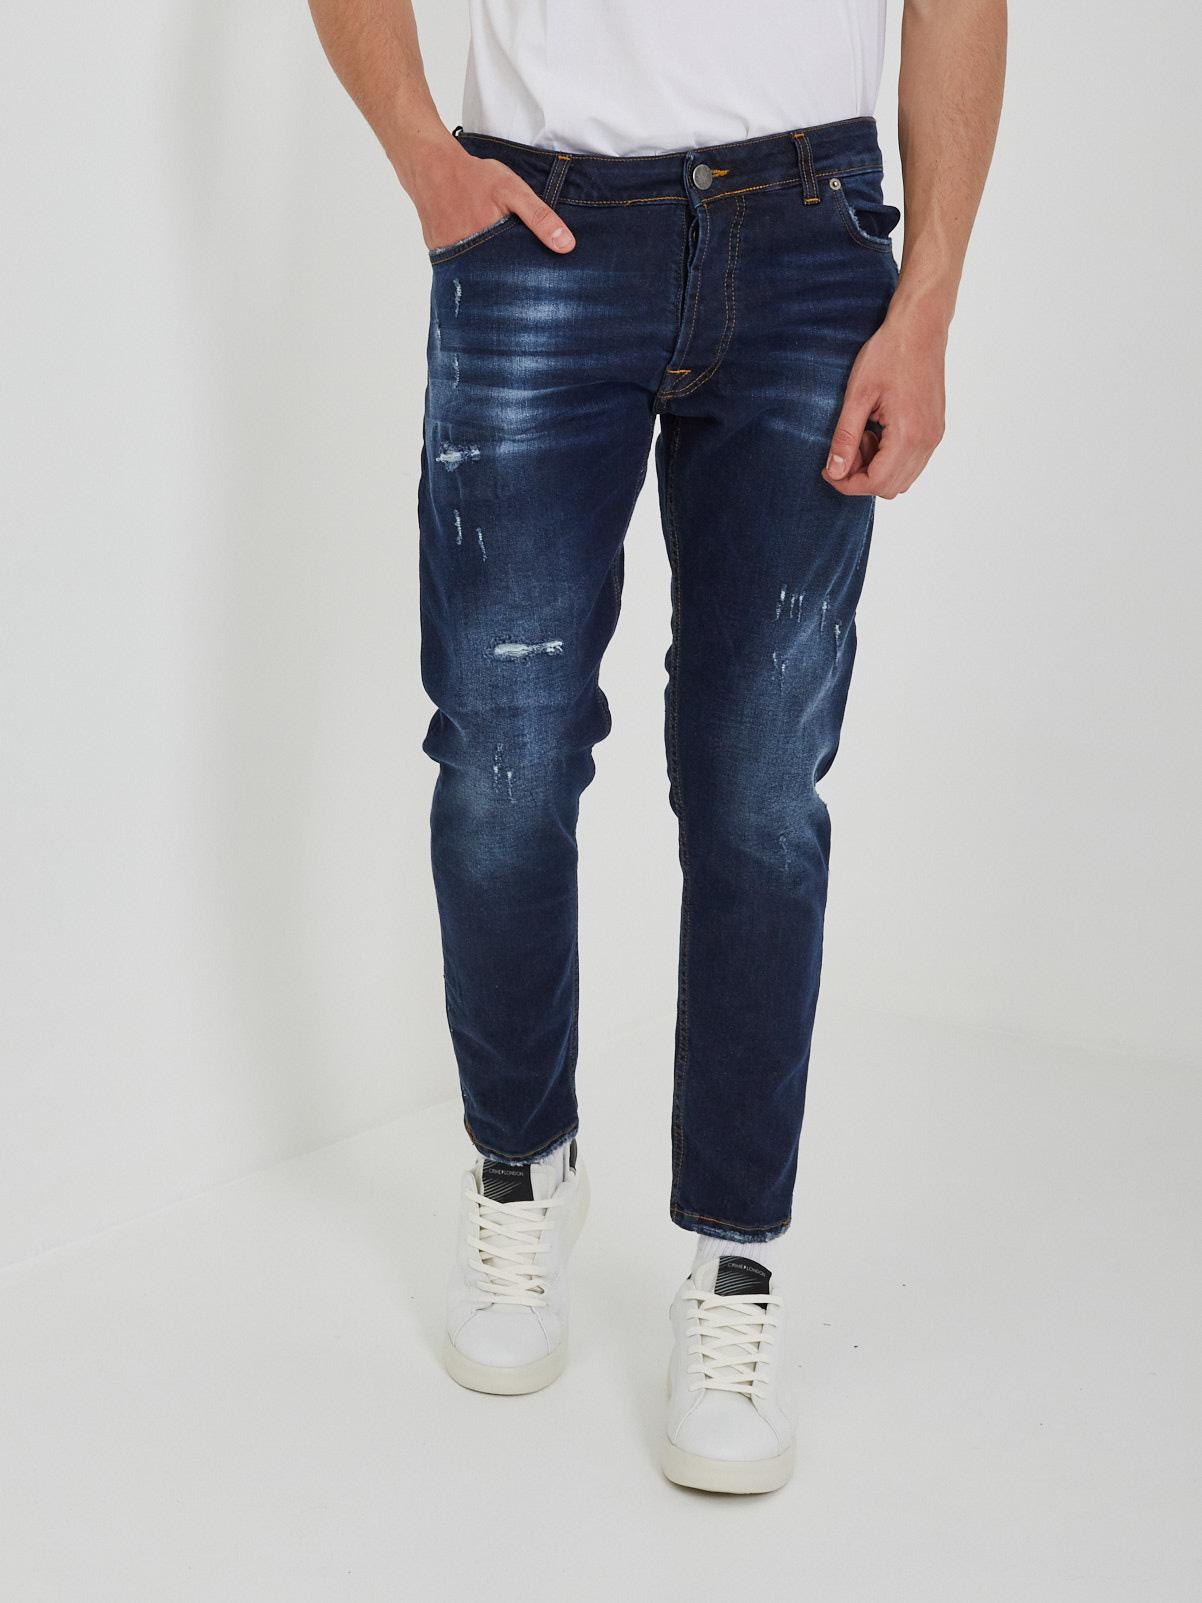 Jeans INSANITY | Jeans | DESNABLU